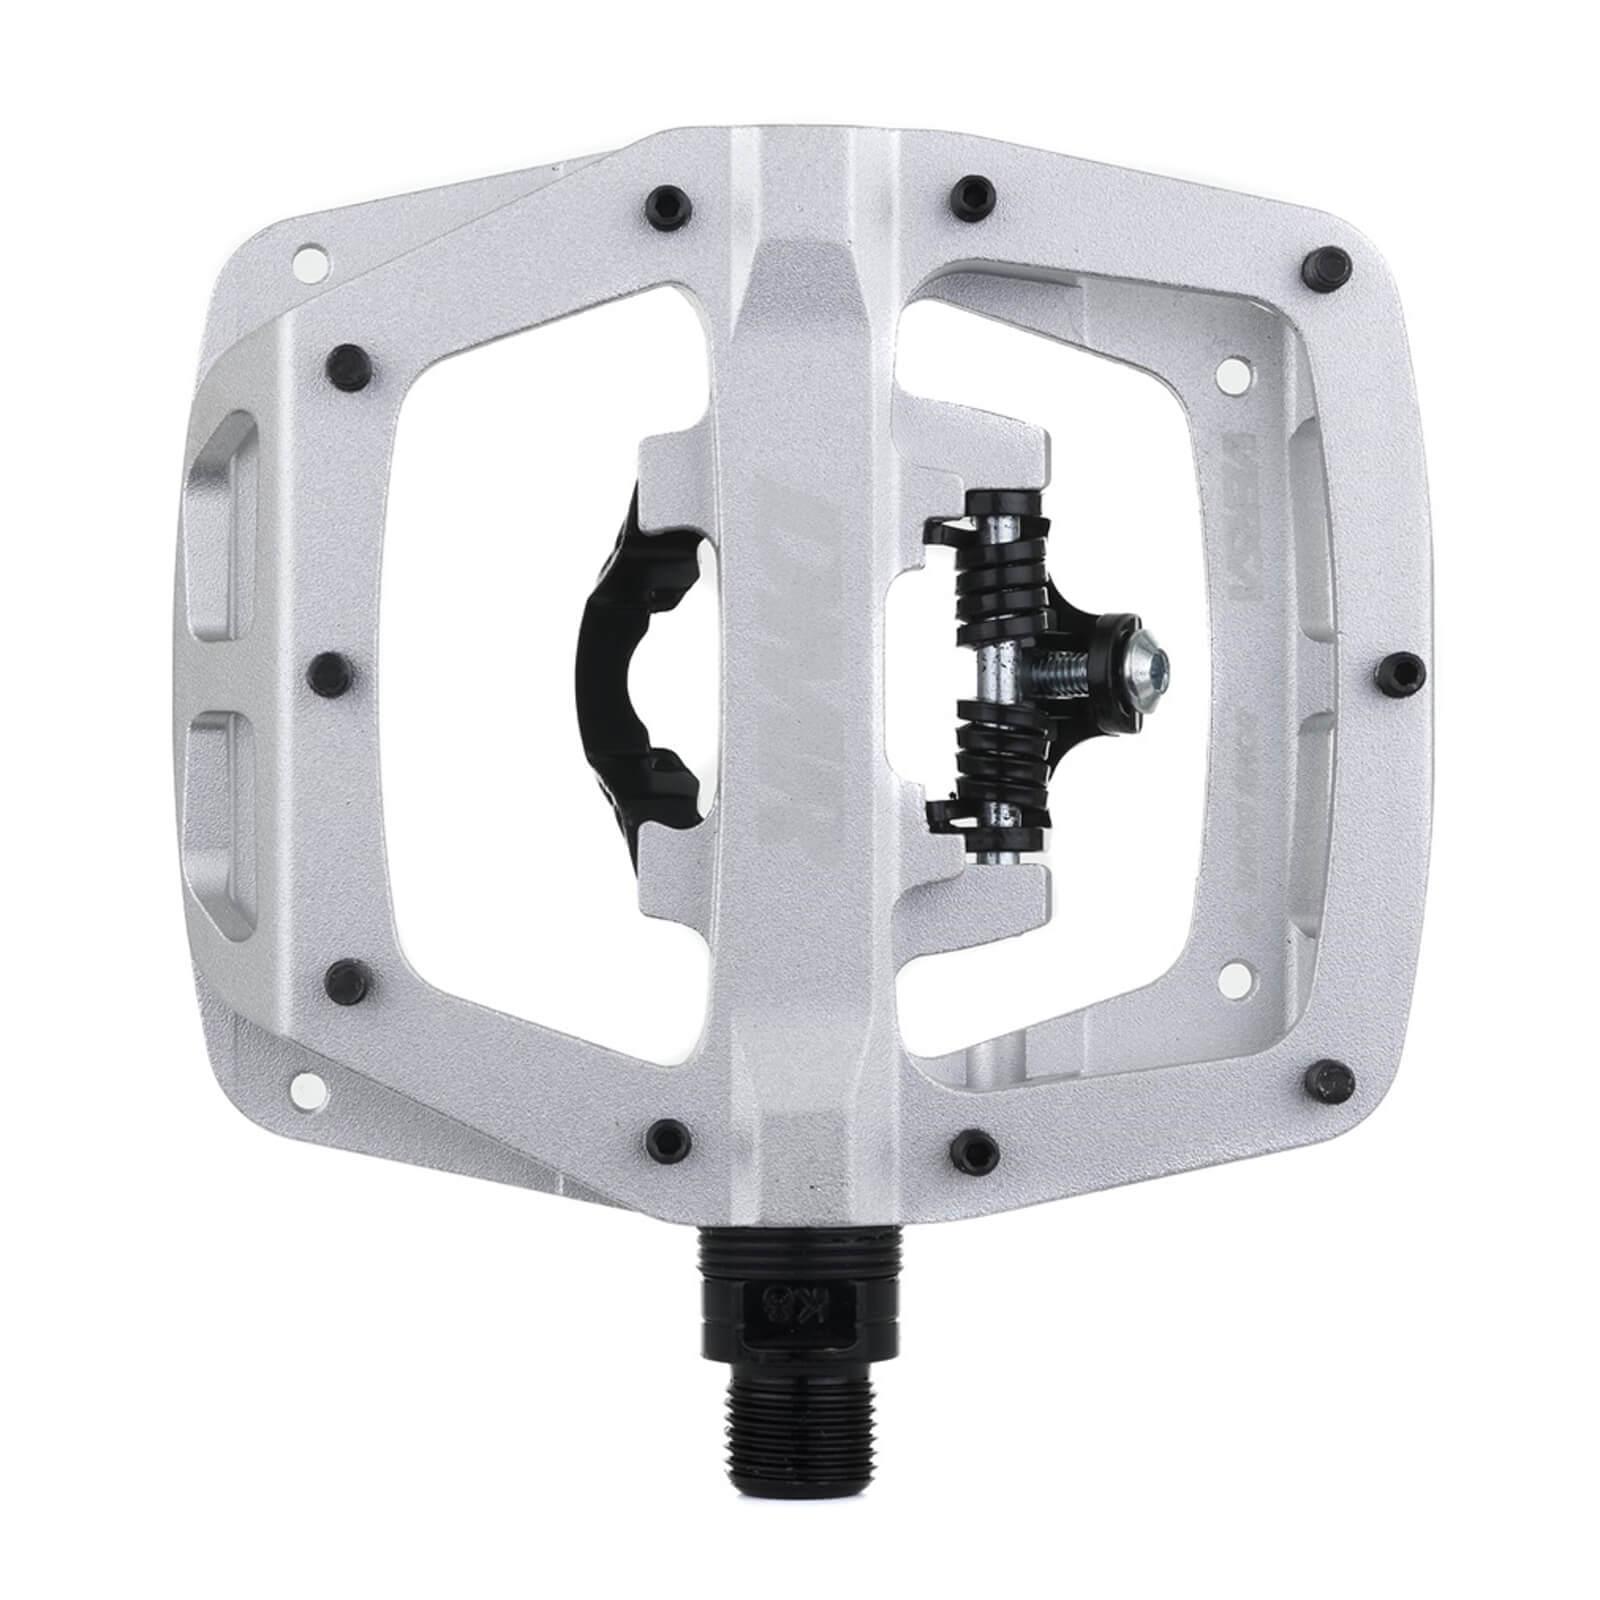 DMR Versa Dual Sided Pedal - Silver